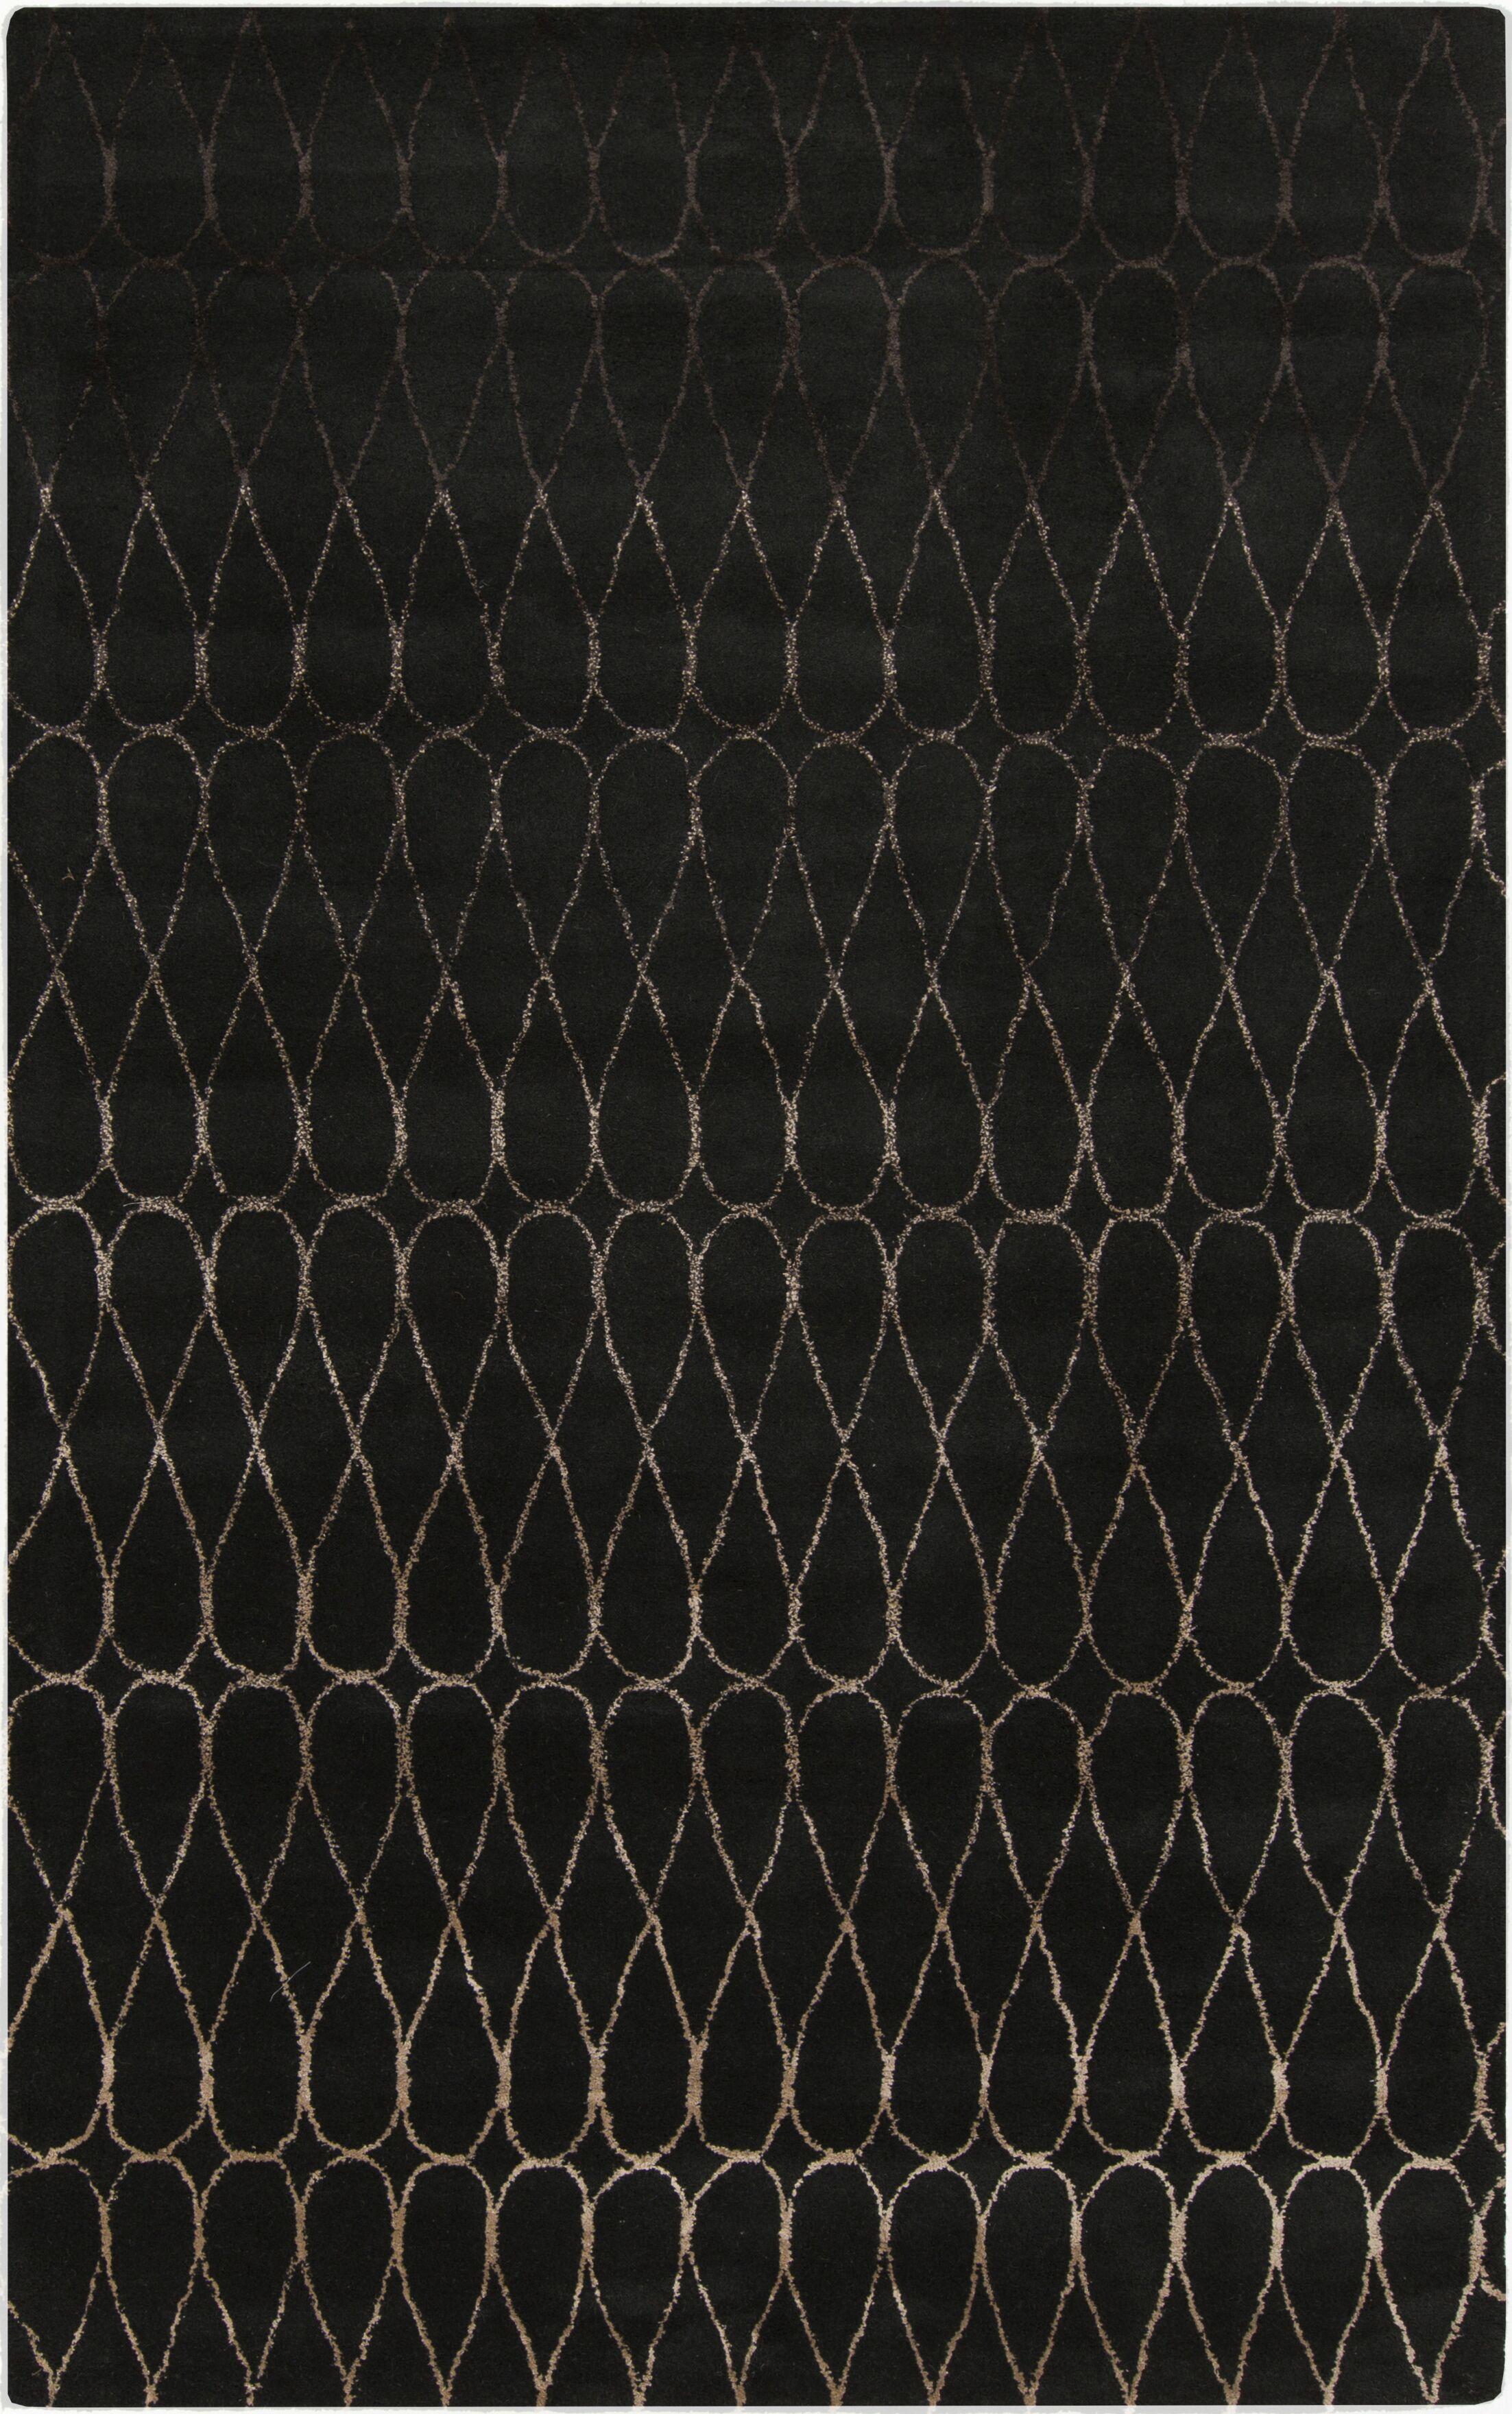 Romola Geometric Charcoal Area Rug Rug Size: Runner 2'6